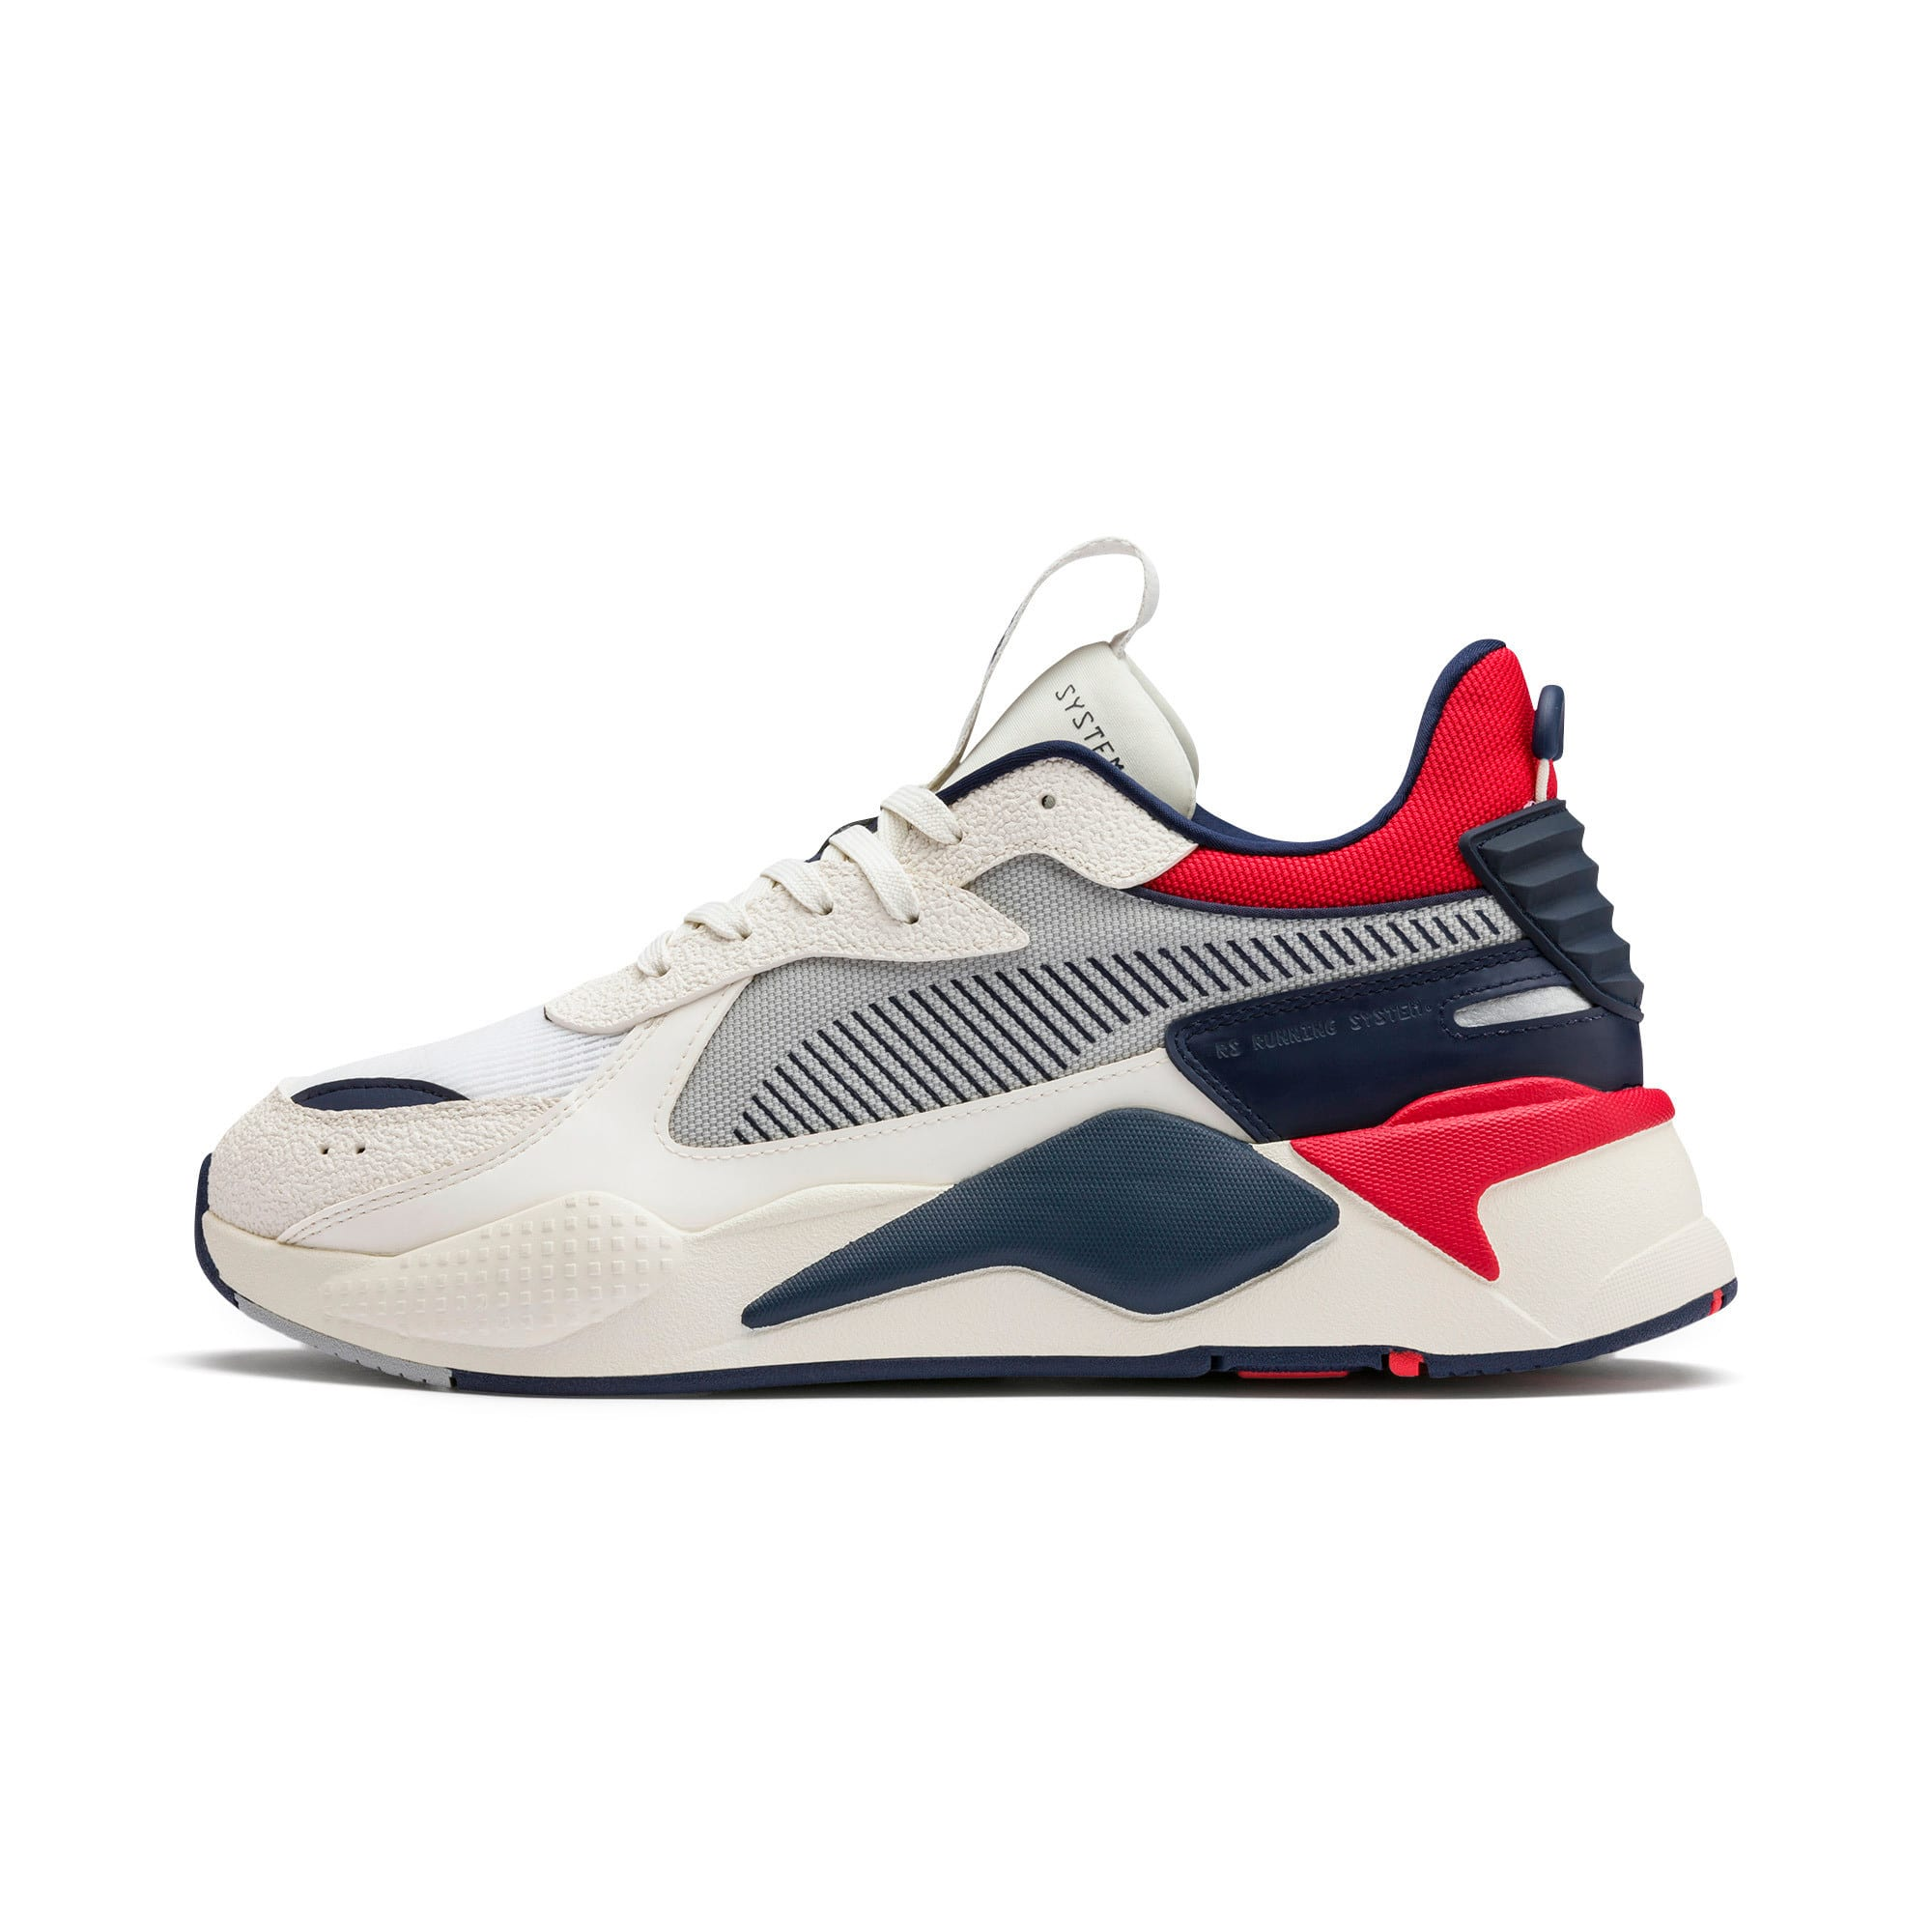 Thumbnail 1 of RS-X Hard Drive Sneaker, Whisper White-Peacoat, medium